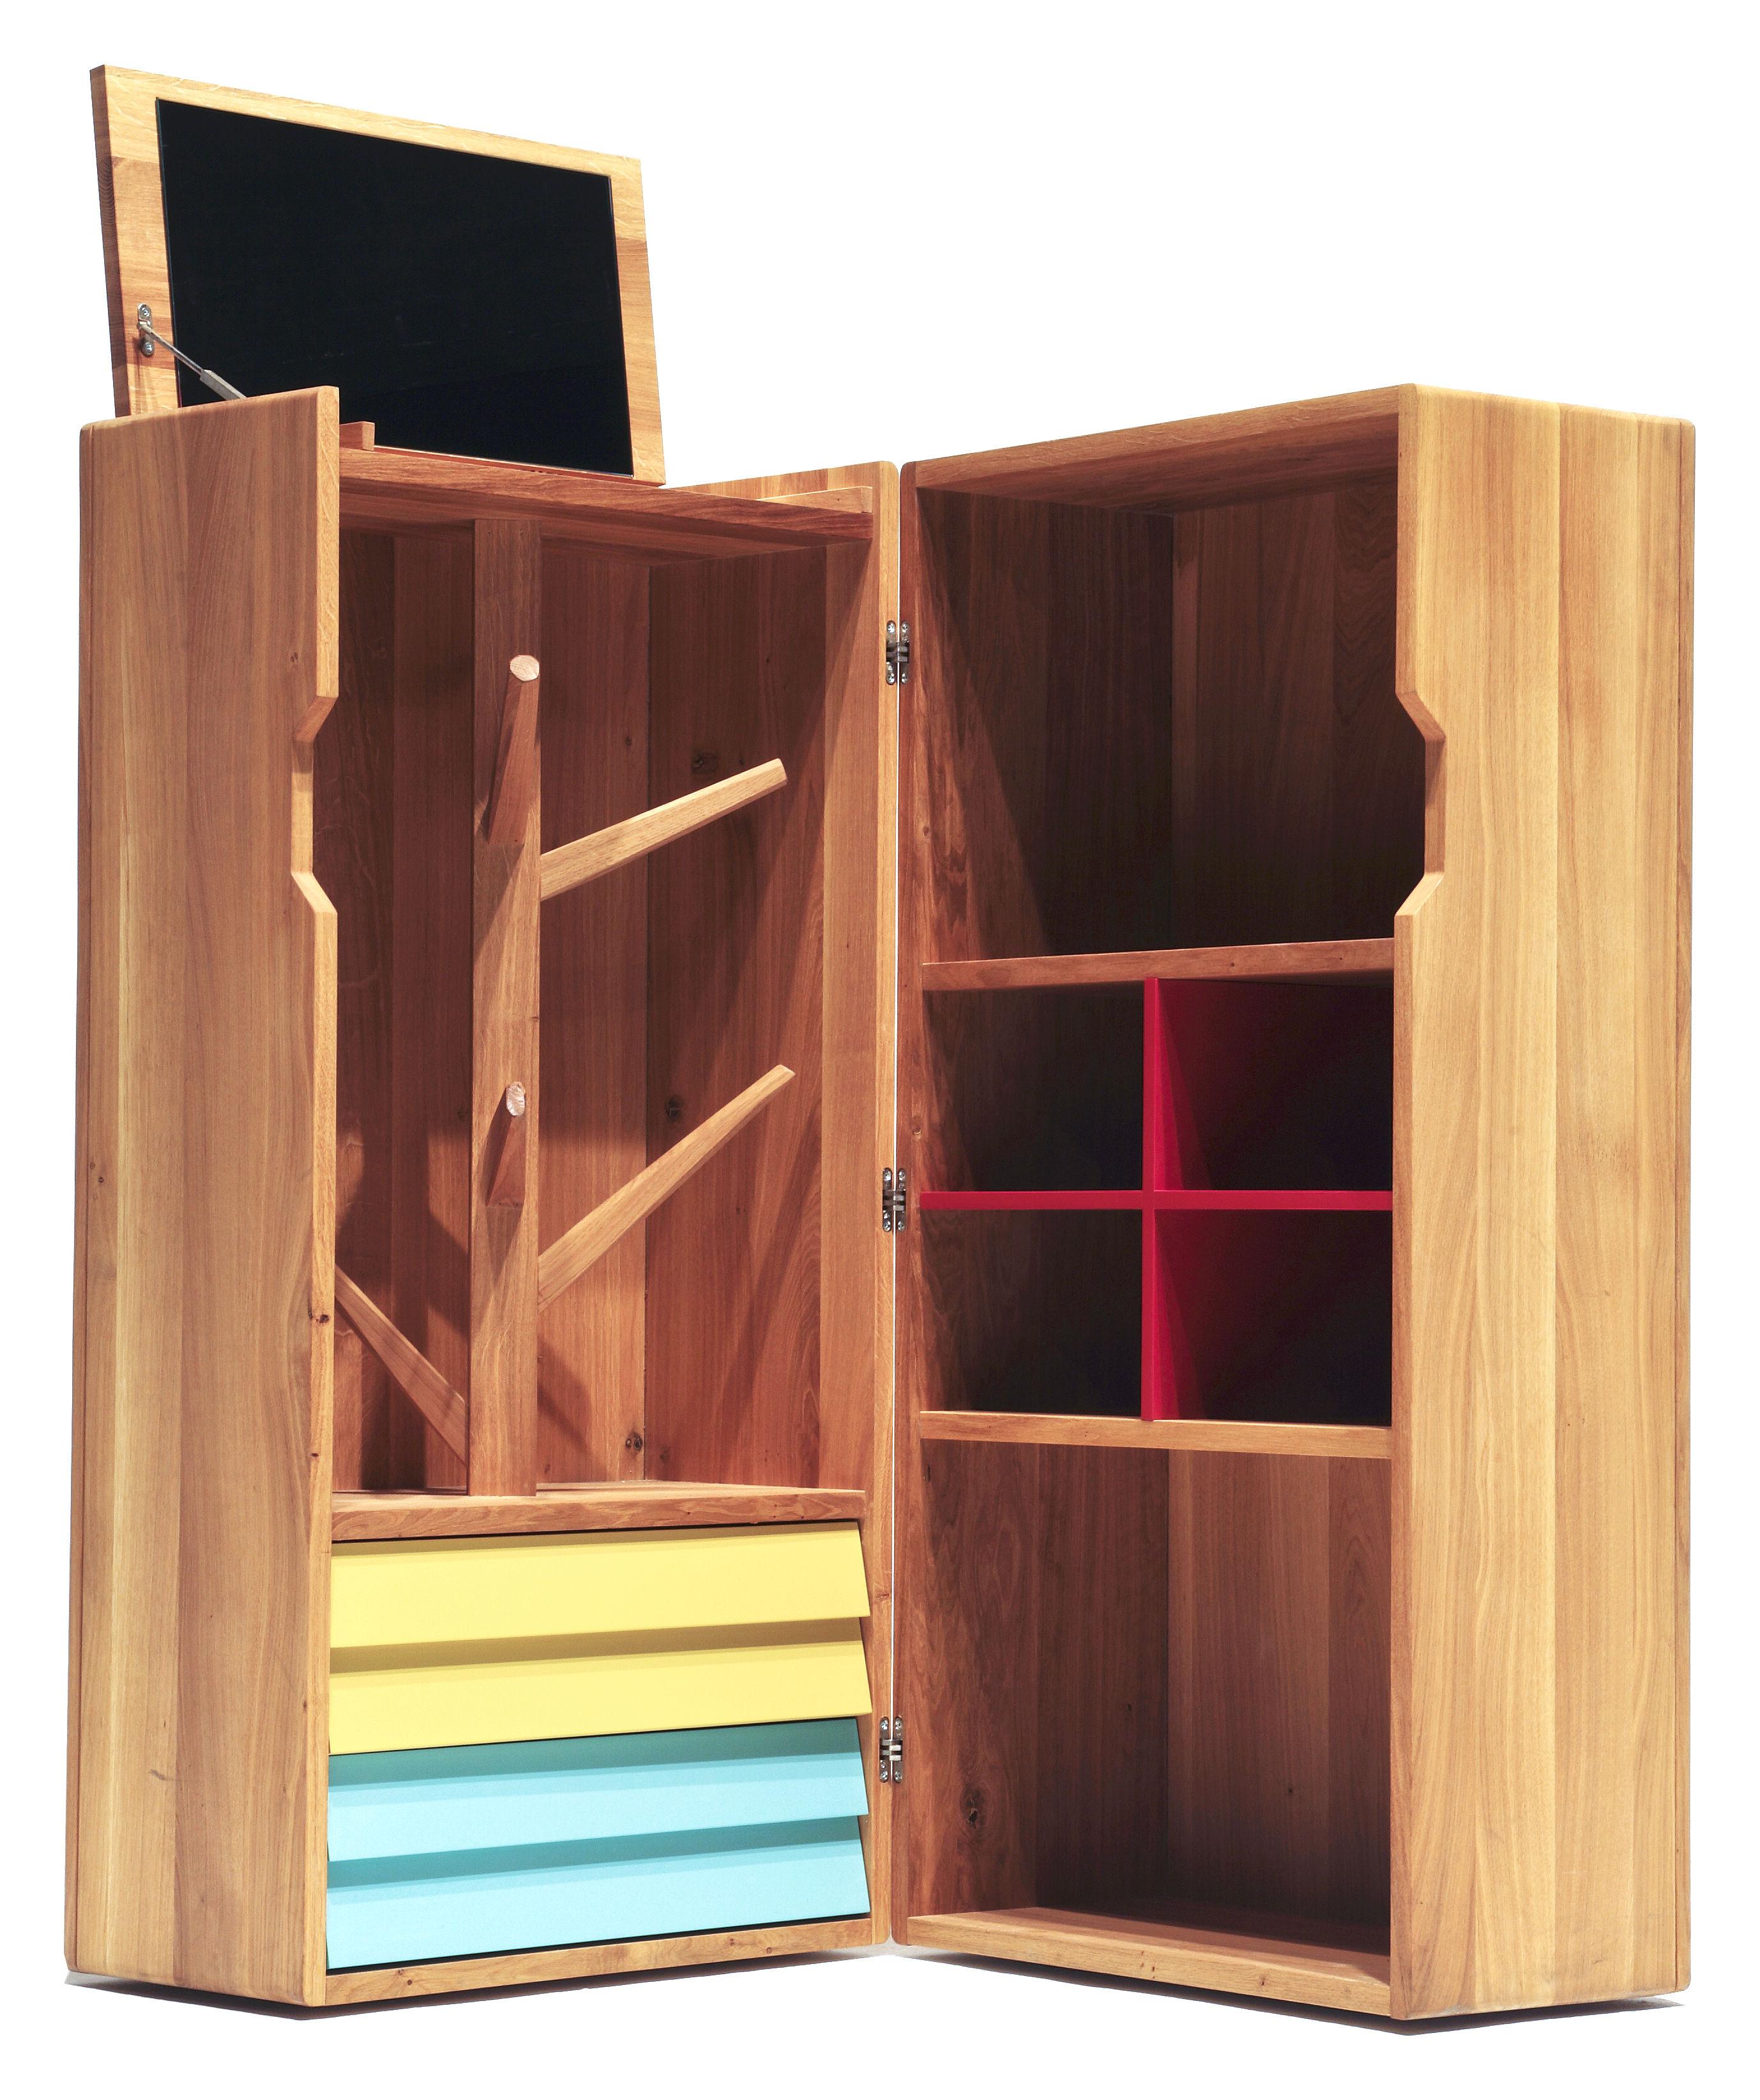 malle remix dressing l 140 x h 140 cm ch ne jaune vert rouge the hansen family. Black Bedroom Furniture Sets. Home Design Ideas